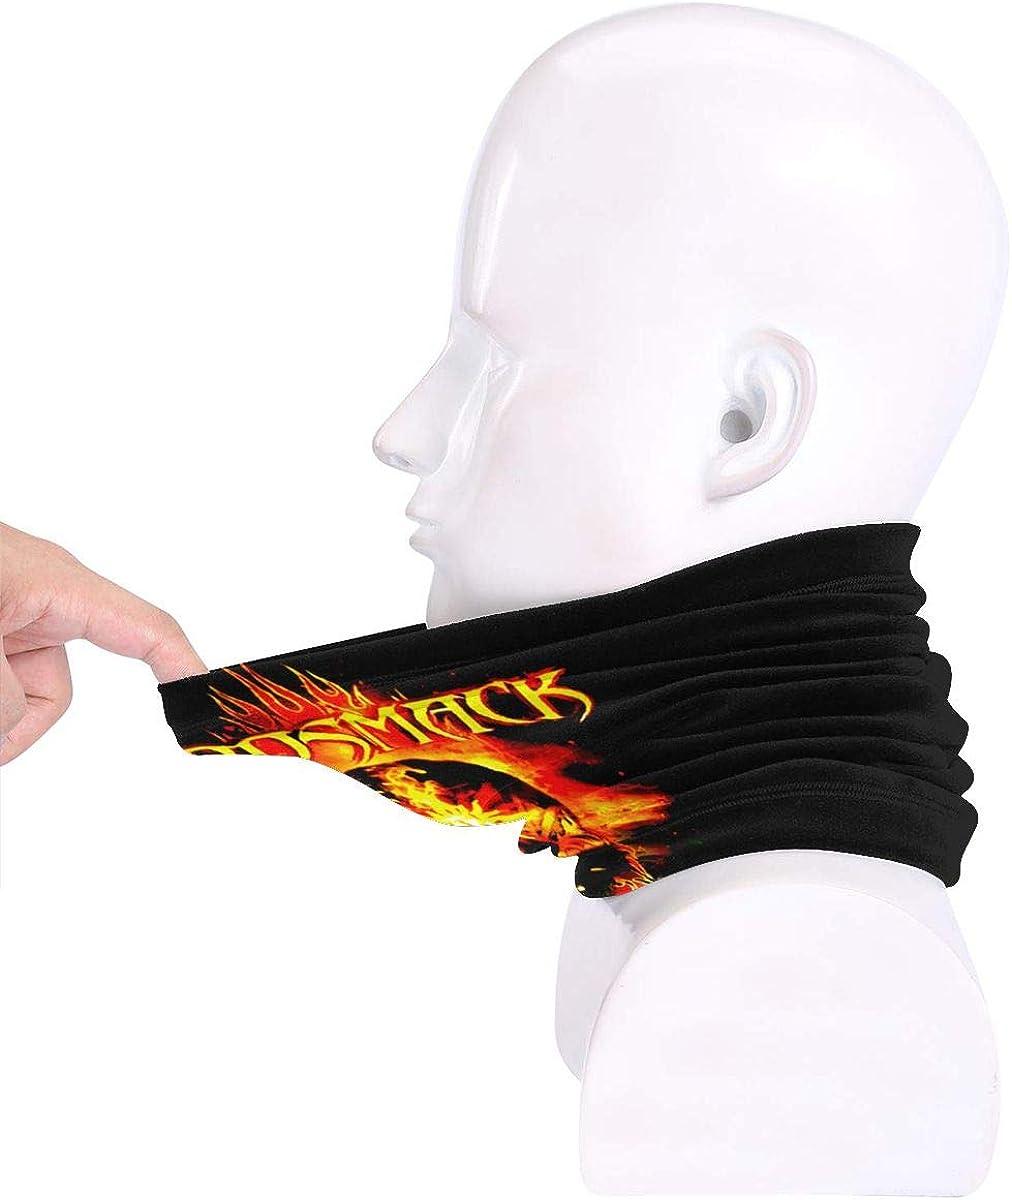 Godsmack Highly Elastic Warm Microfiber Neck Thermal Mask Scarf Unisex Windproof Suitable For Winter